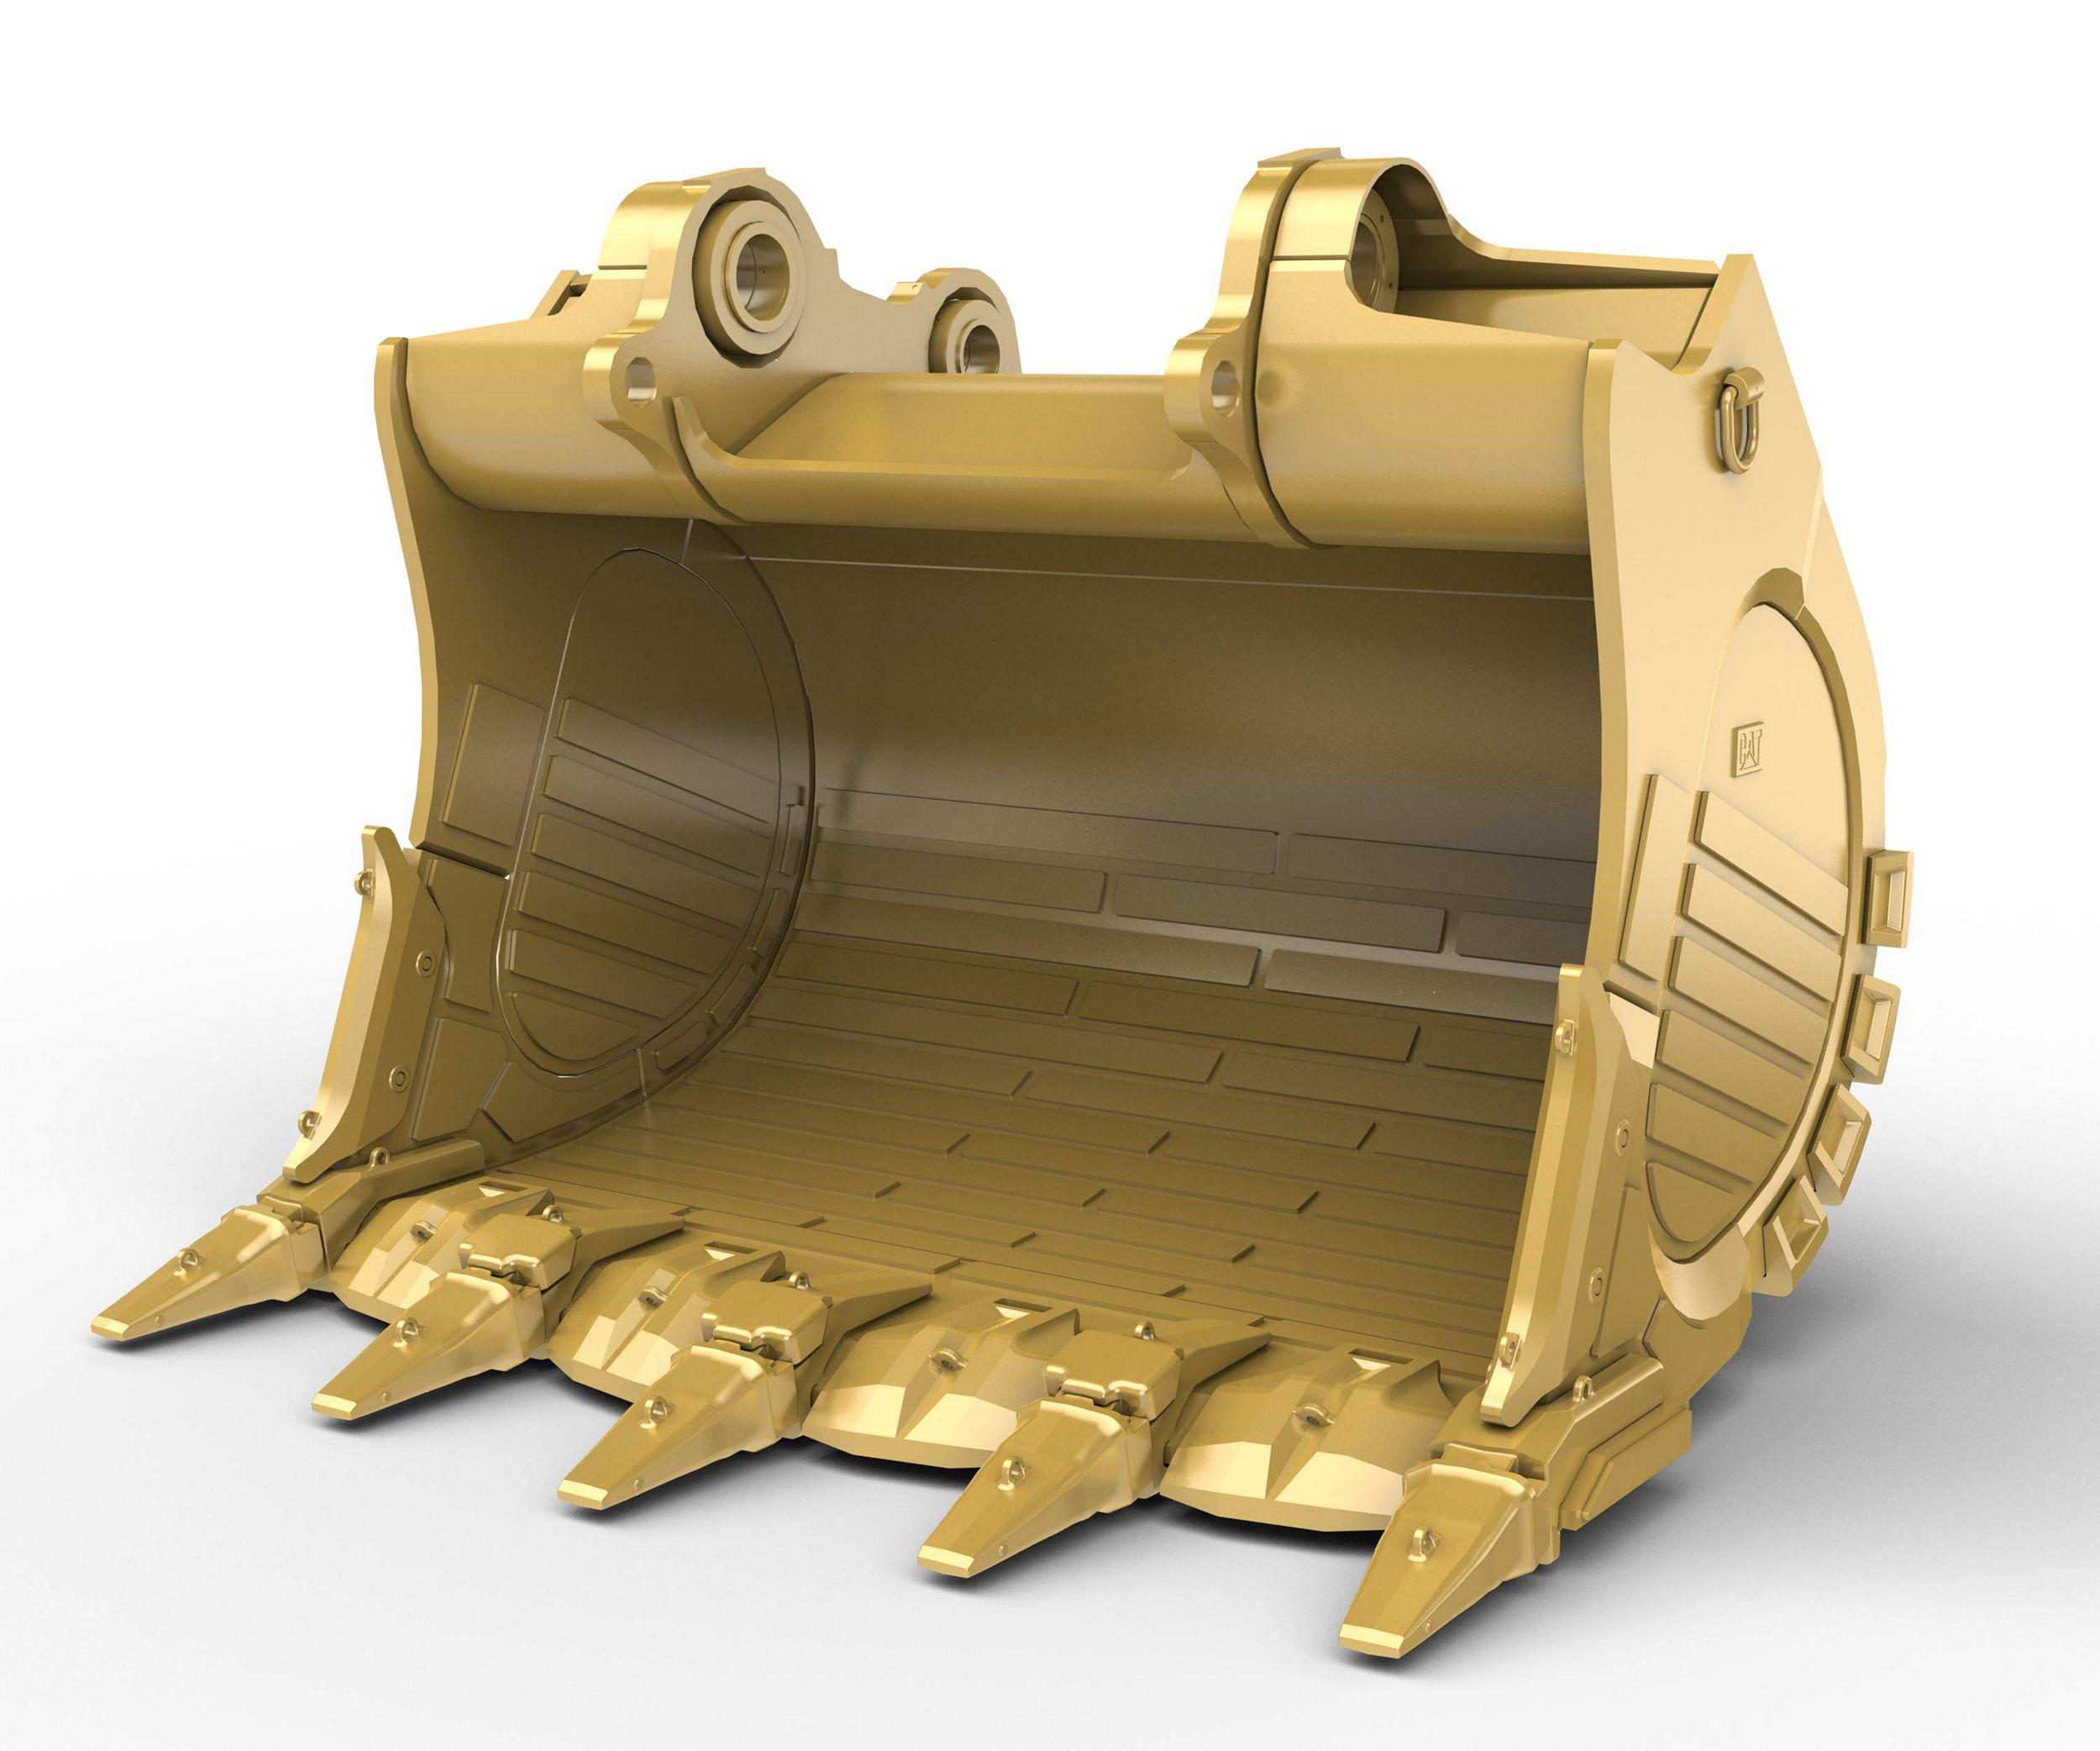 15m³ (19.6yd³) Heavy Rock bucket for the 6030 Hyd Mining Shovel